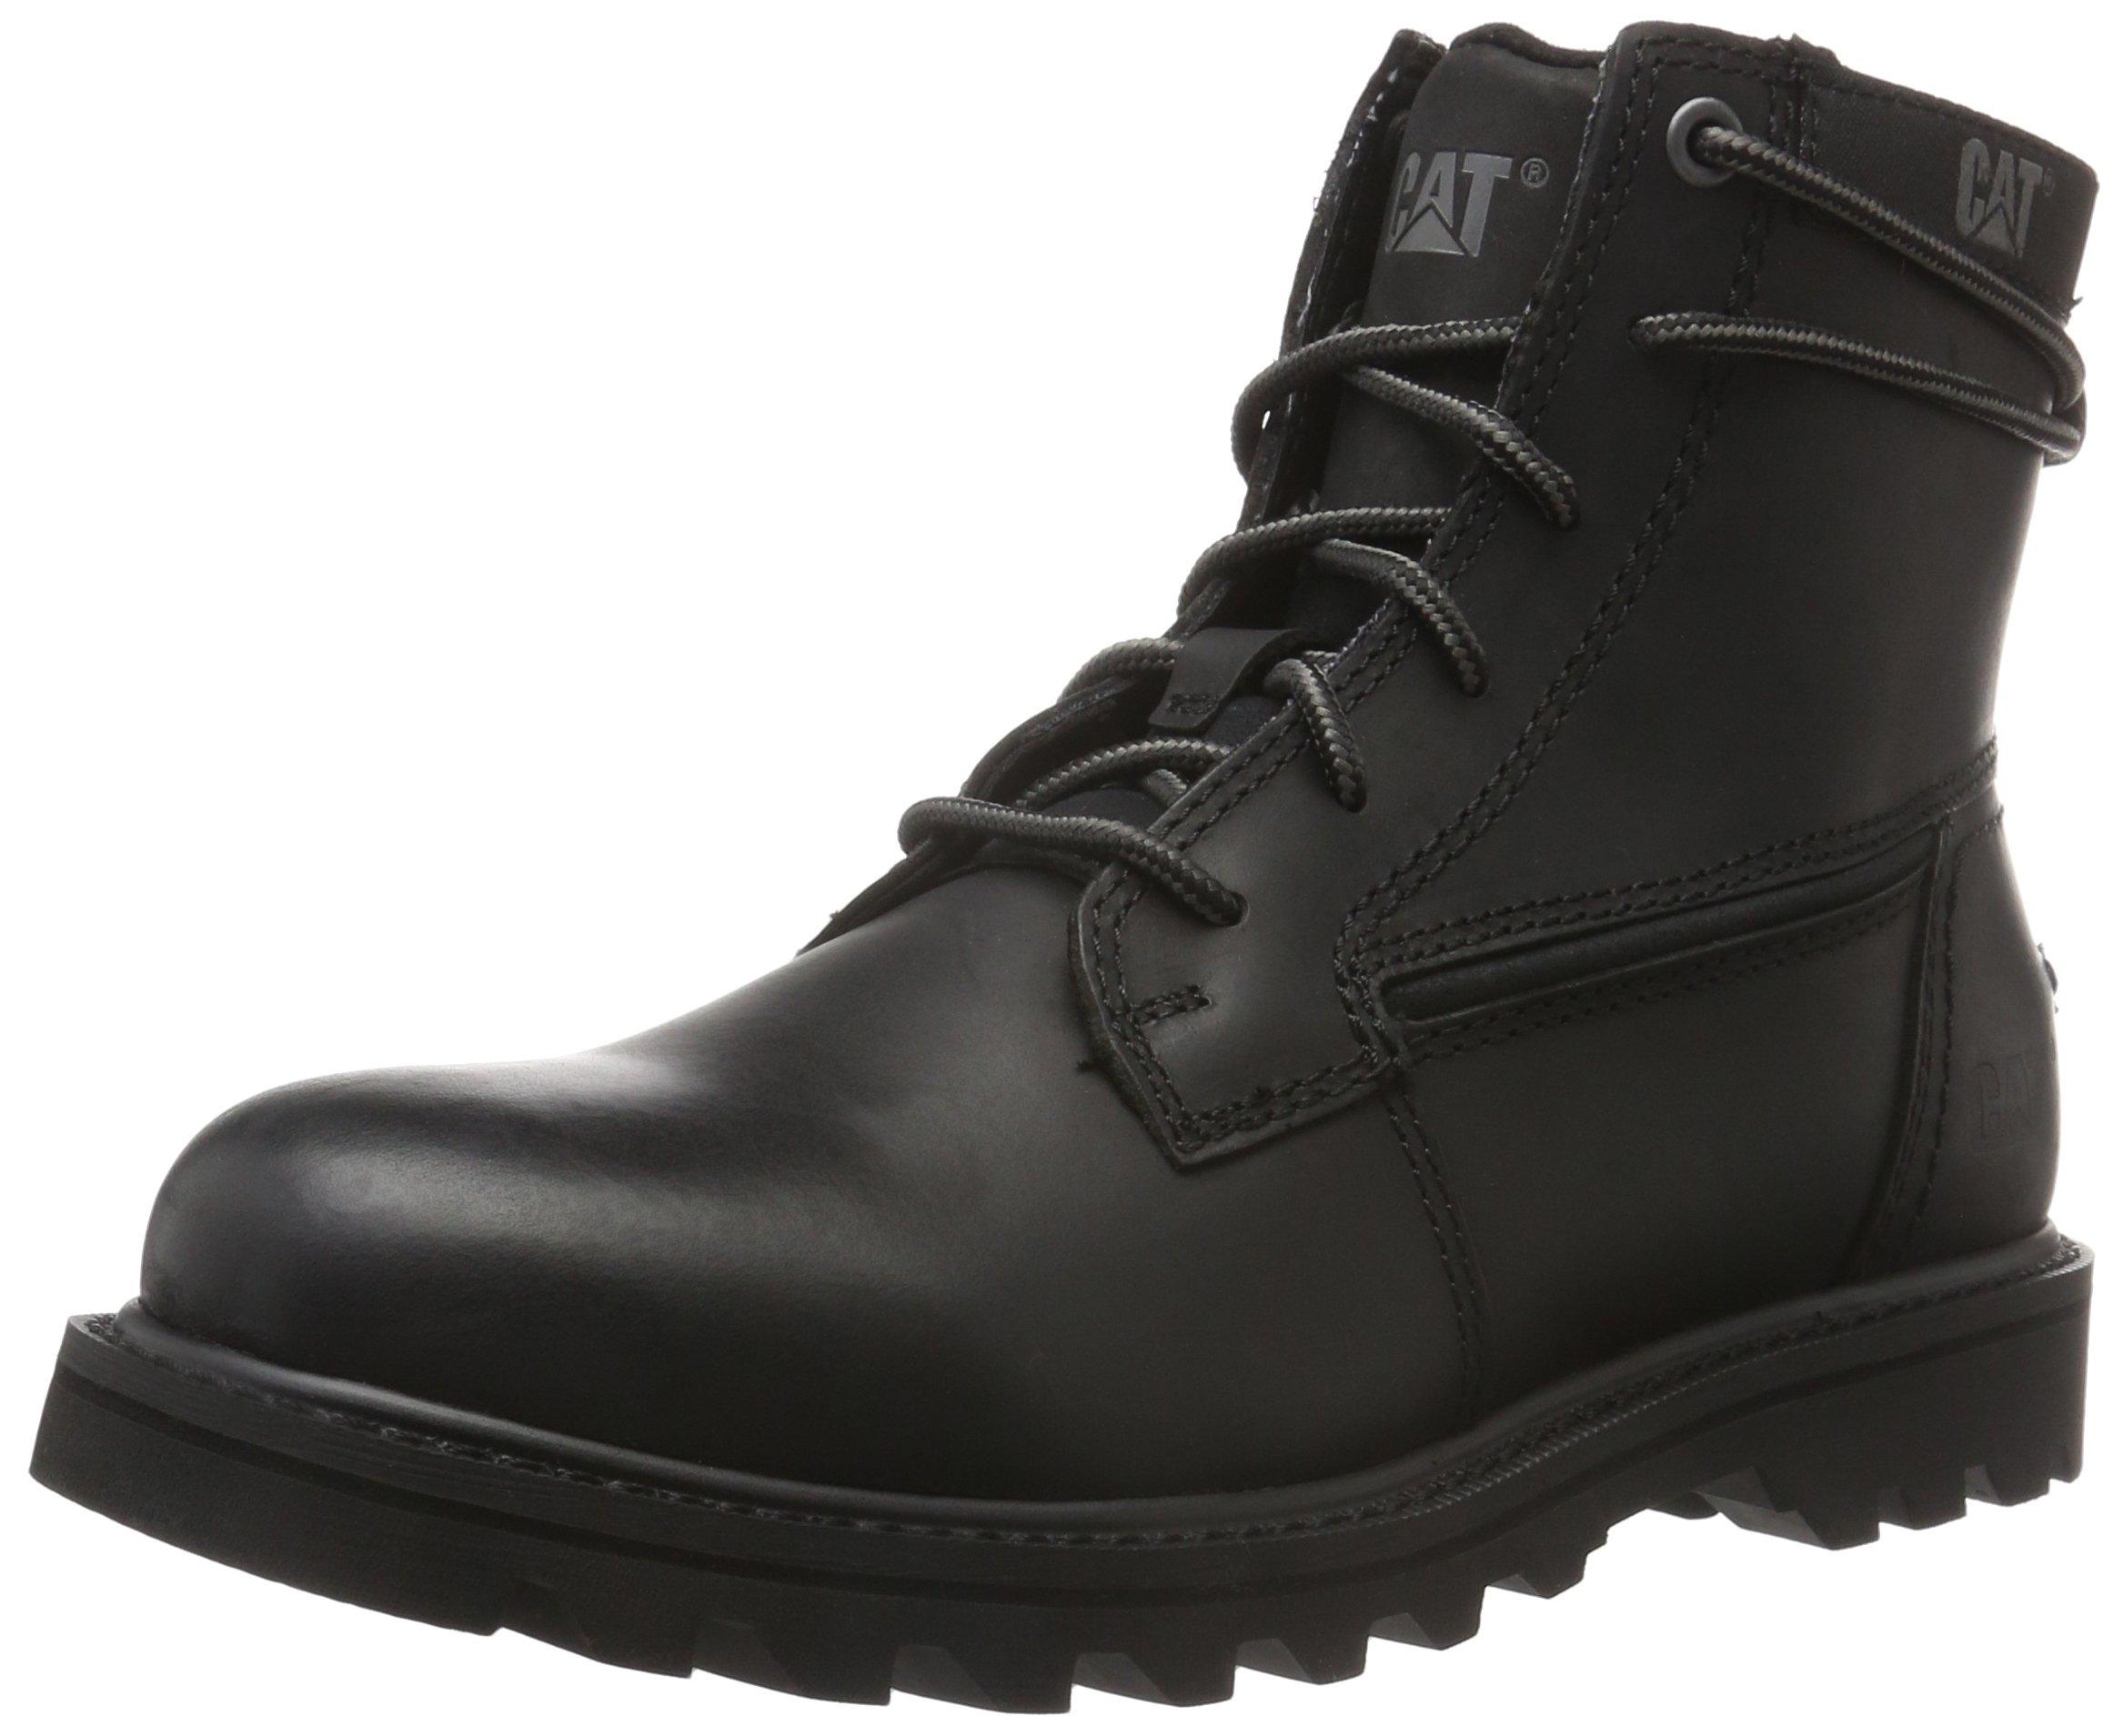 Cat SwingshiftBottes Footwear Classiques Eu HommeNoirblack40 Om0w8nvN